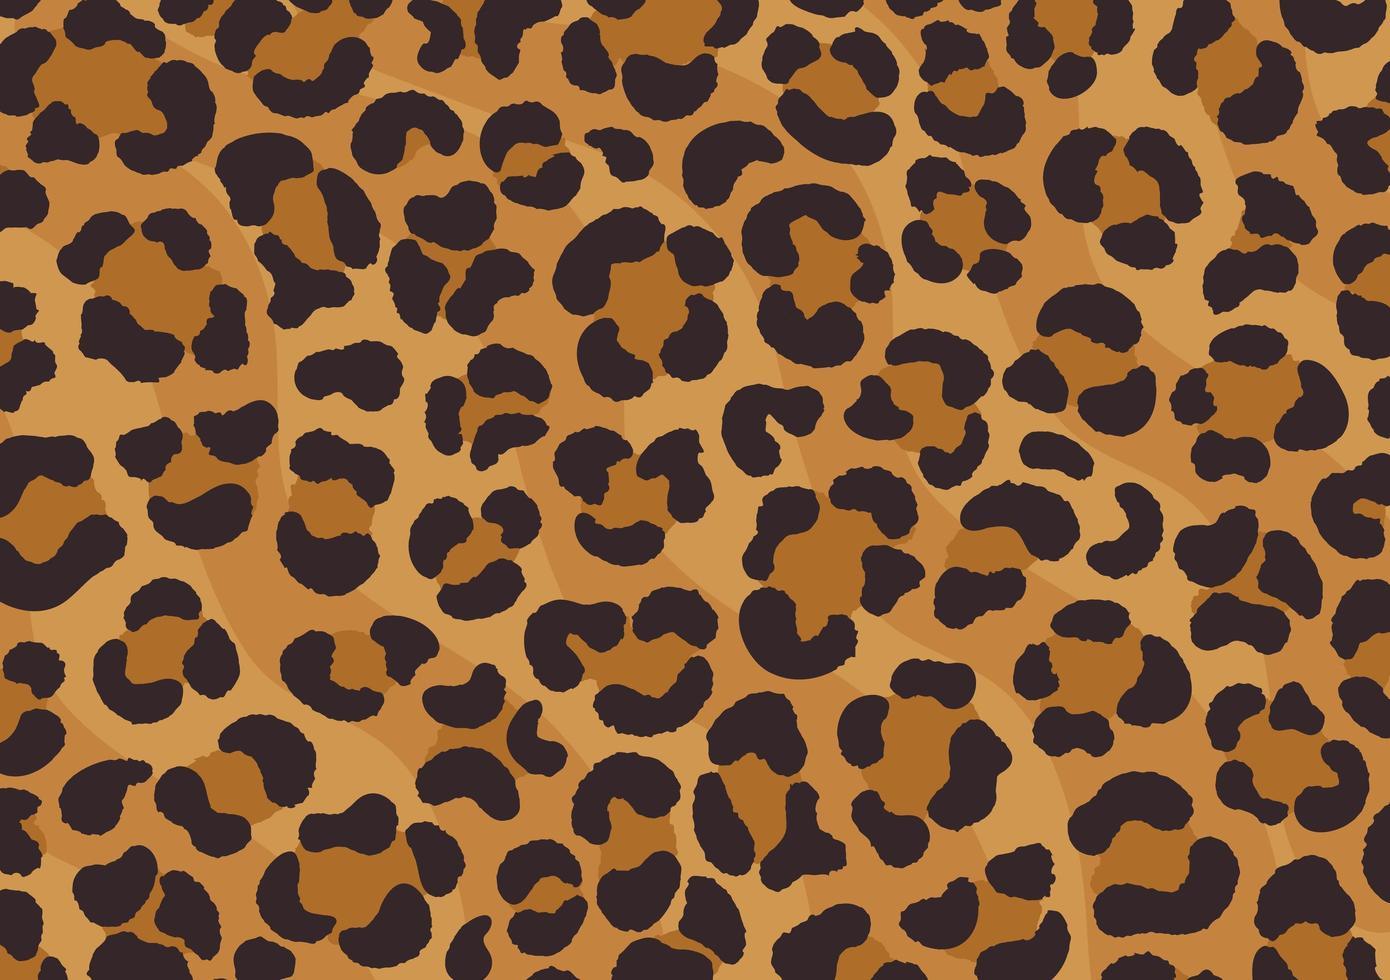 Leopardenmuster. Gepardenhaut. Tierdruck. vektor